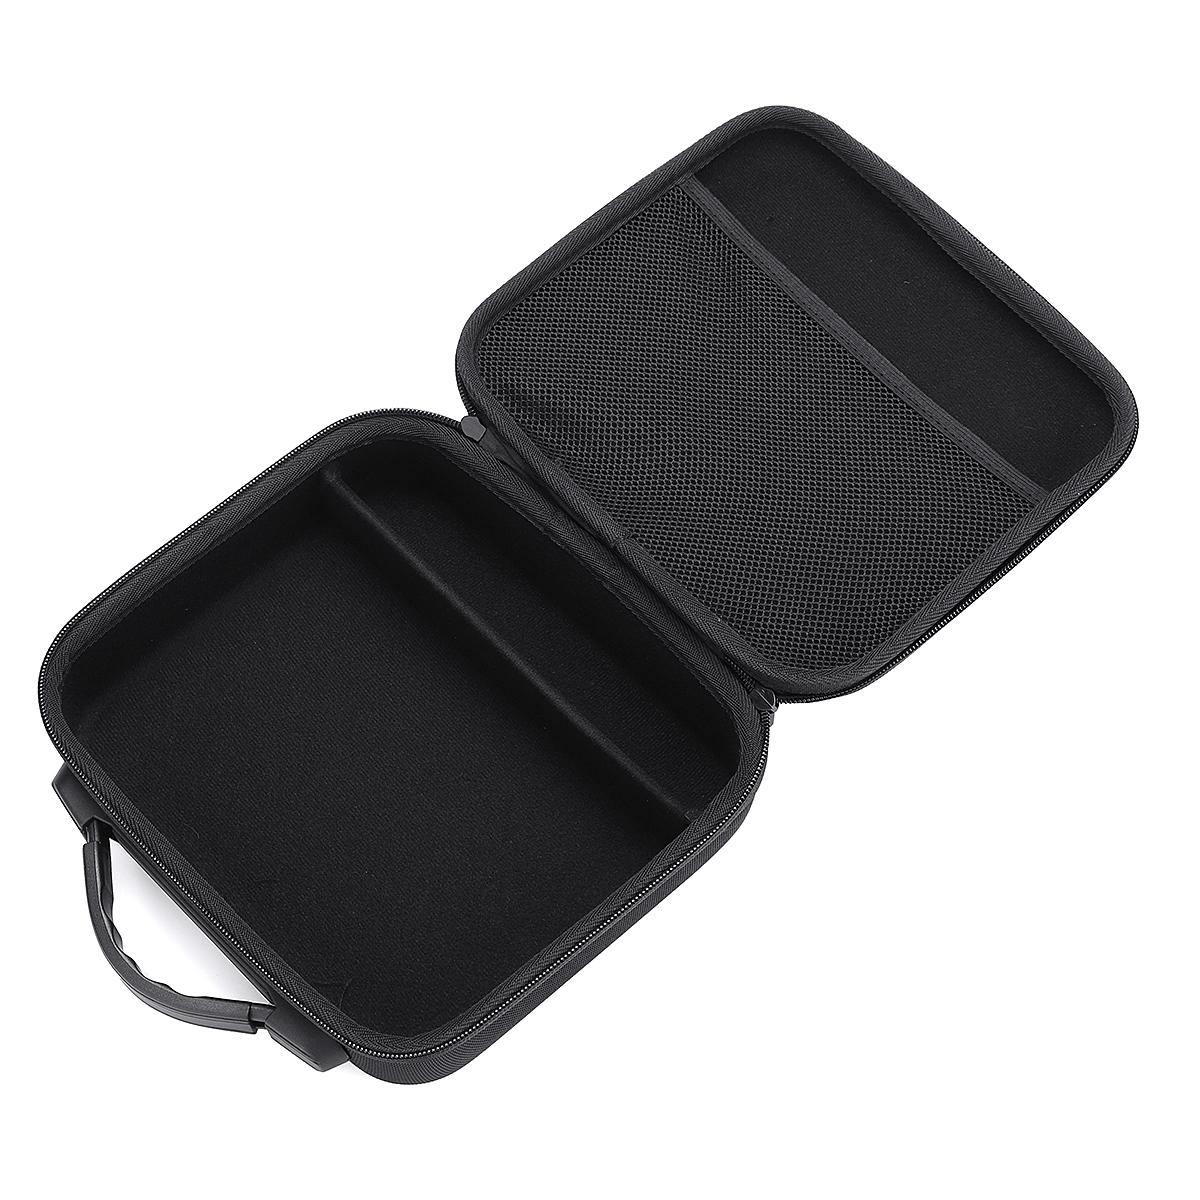 Jumpstarter Emergency Power EVA Portable Hard Case Bag For Noco Genius G7200